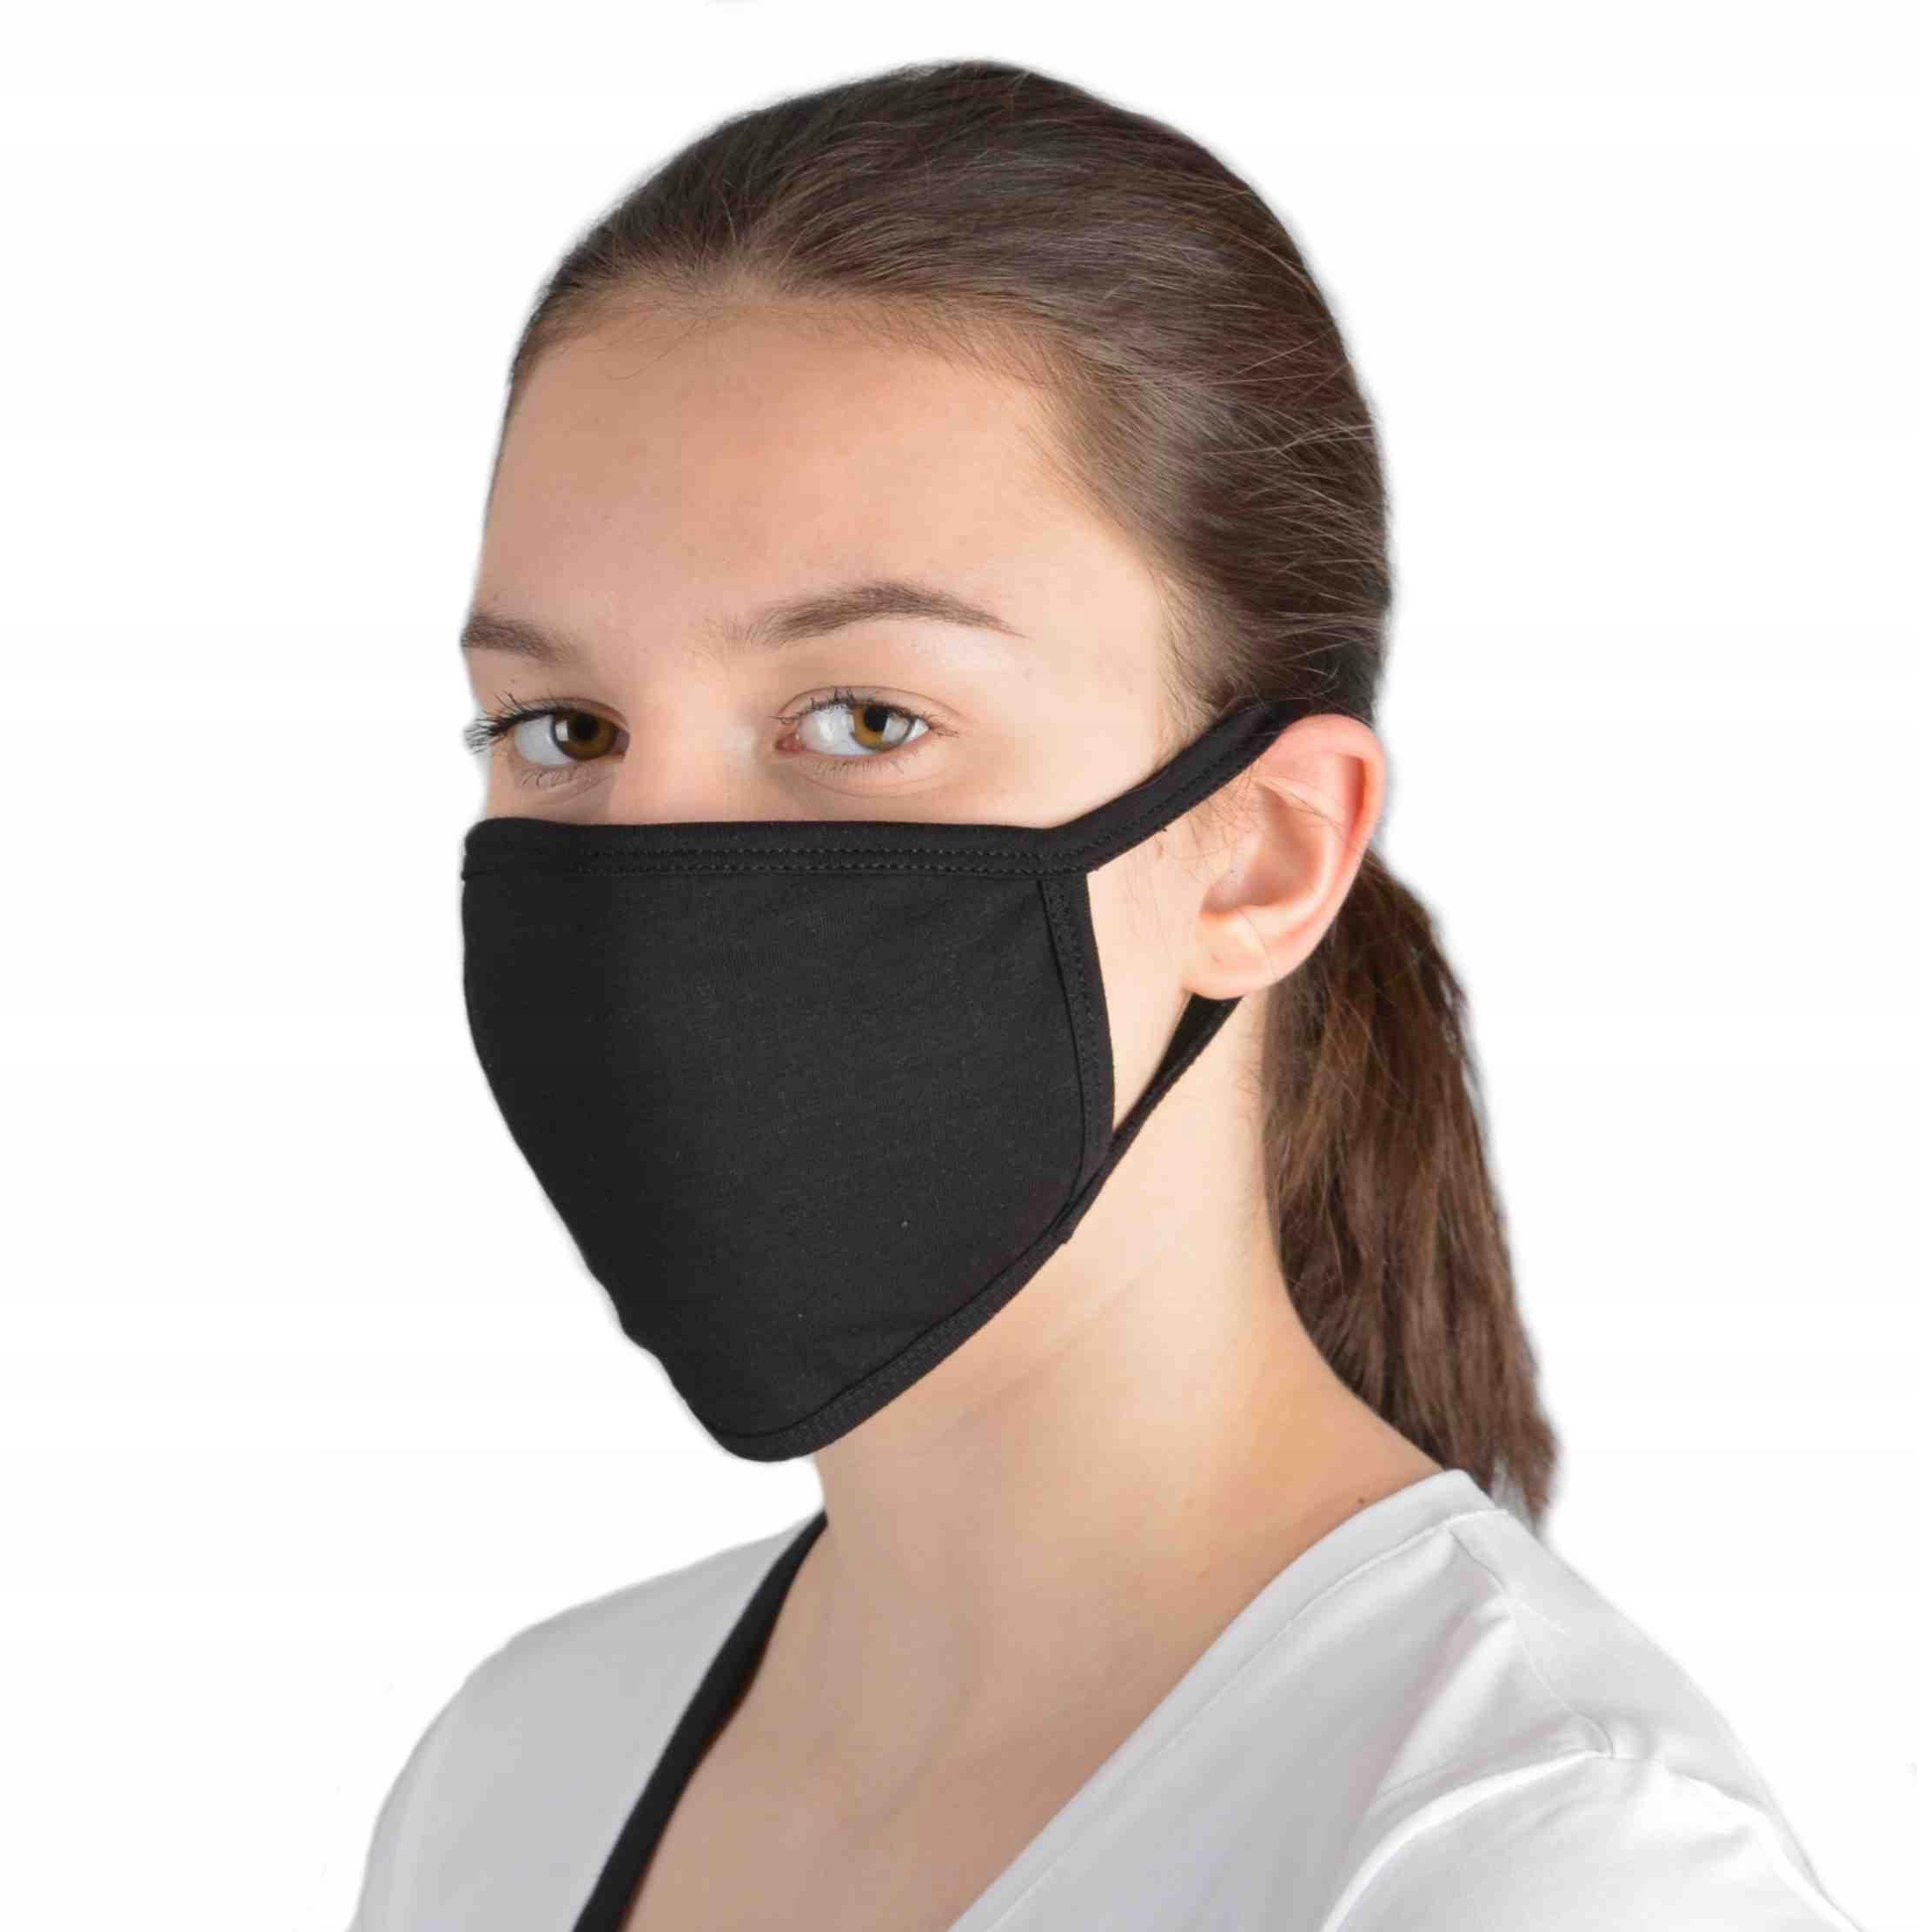 Maska Czarna Street Wear 100 % Produkt POLSKI